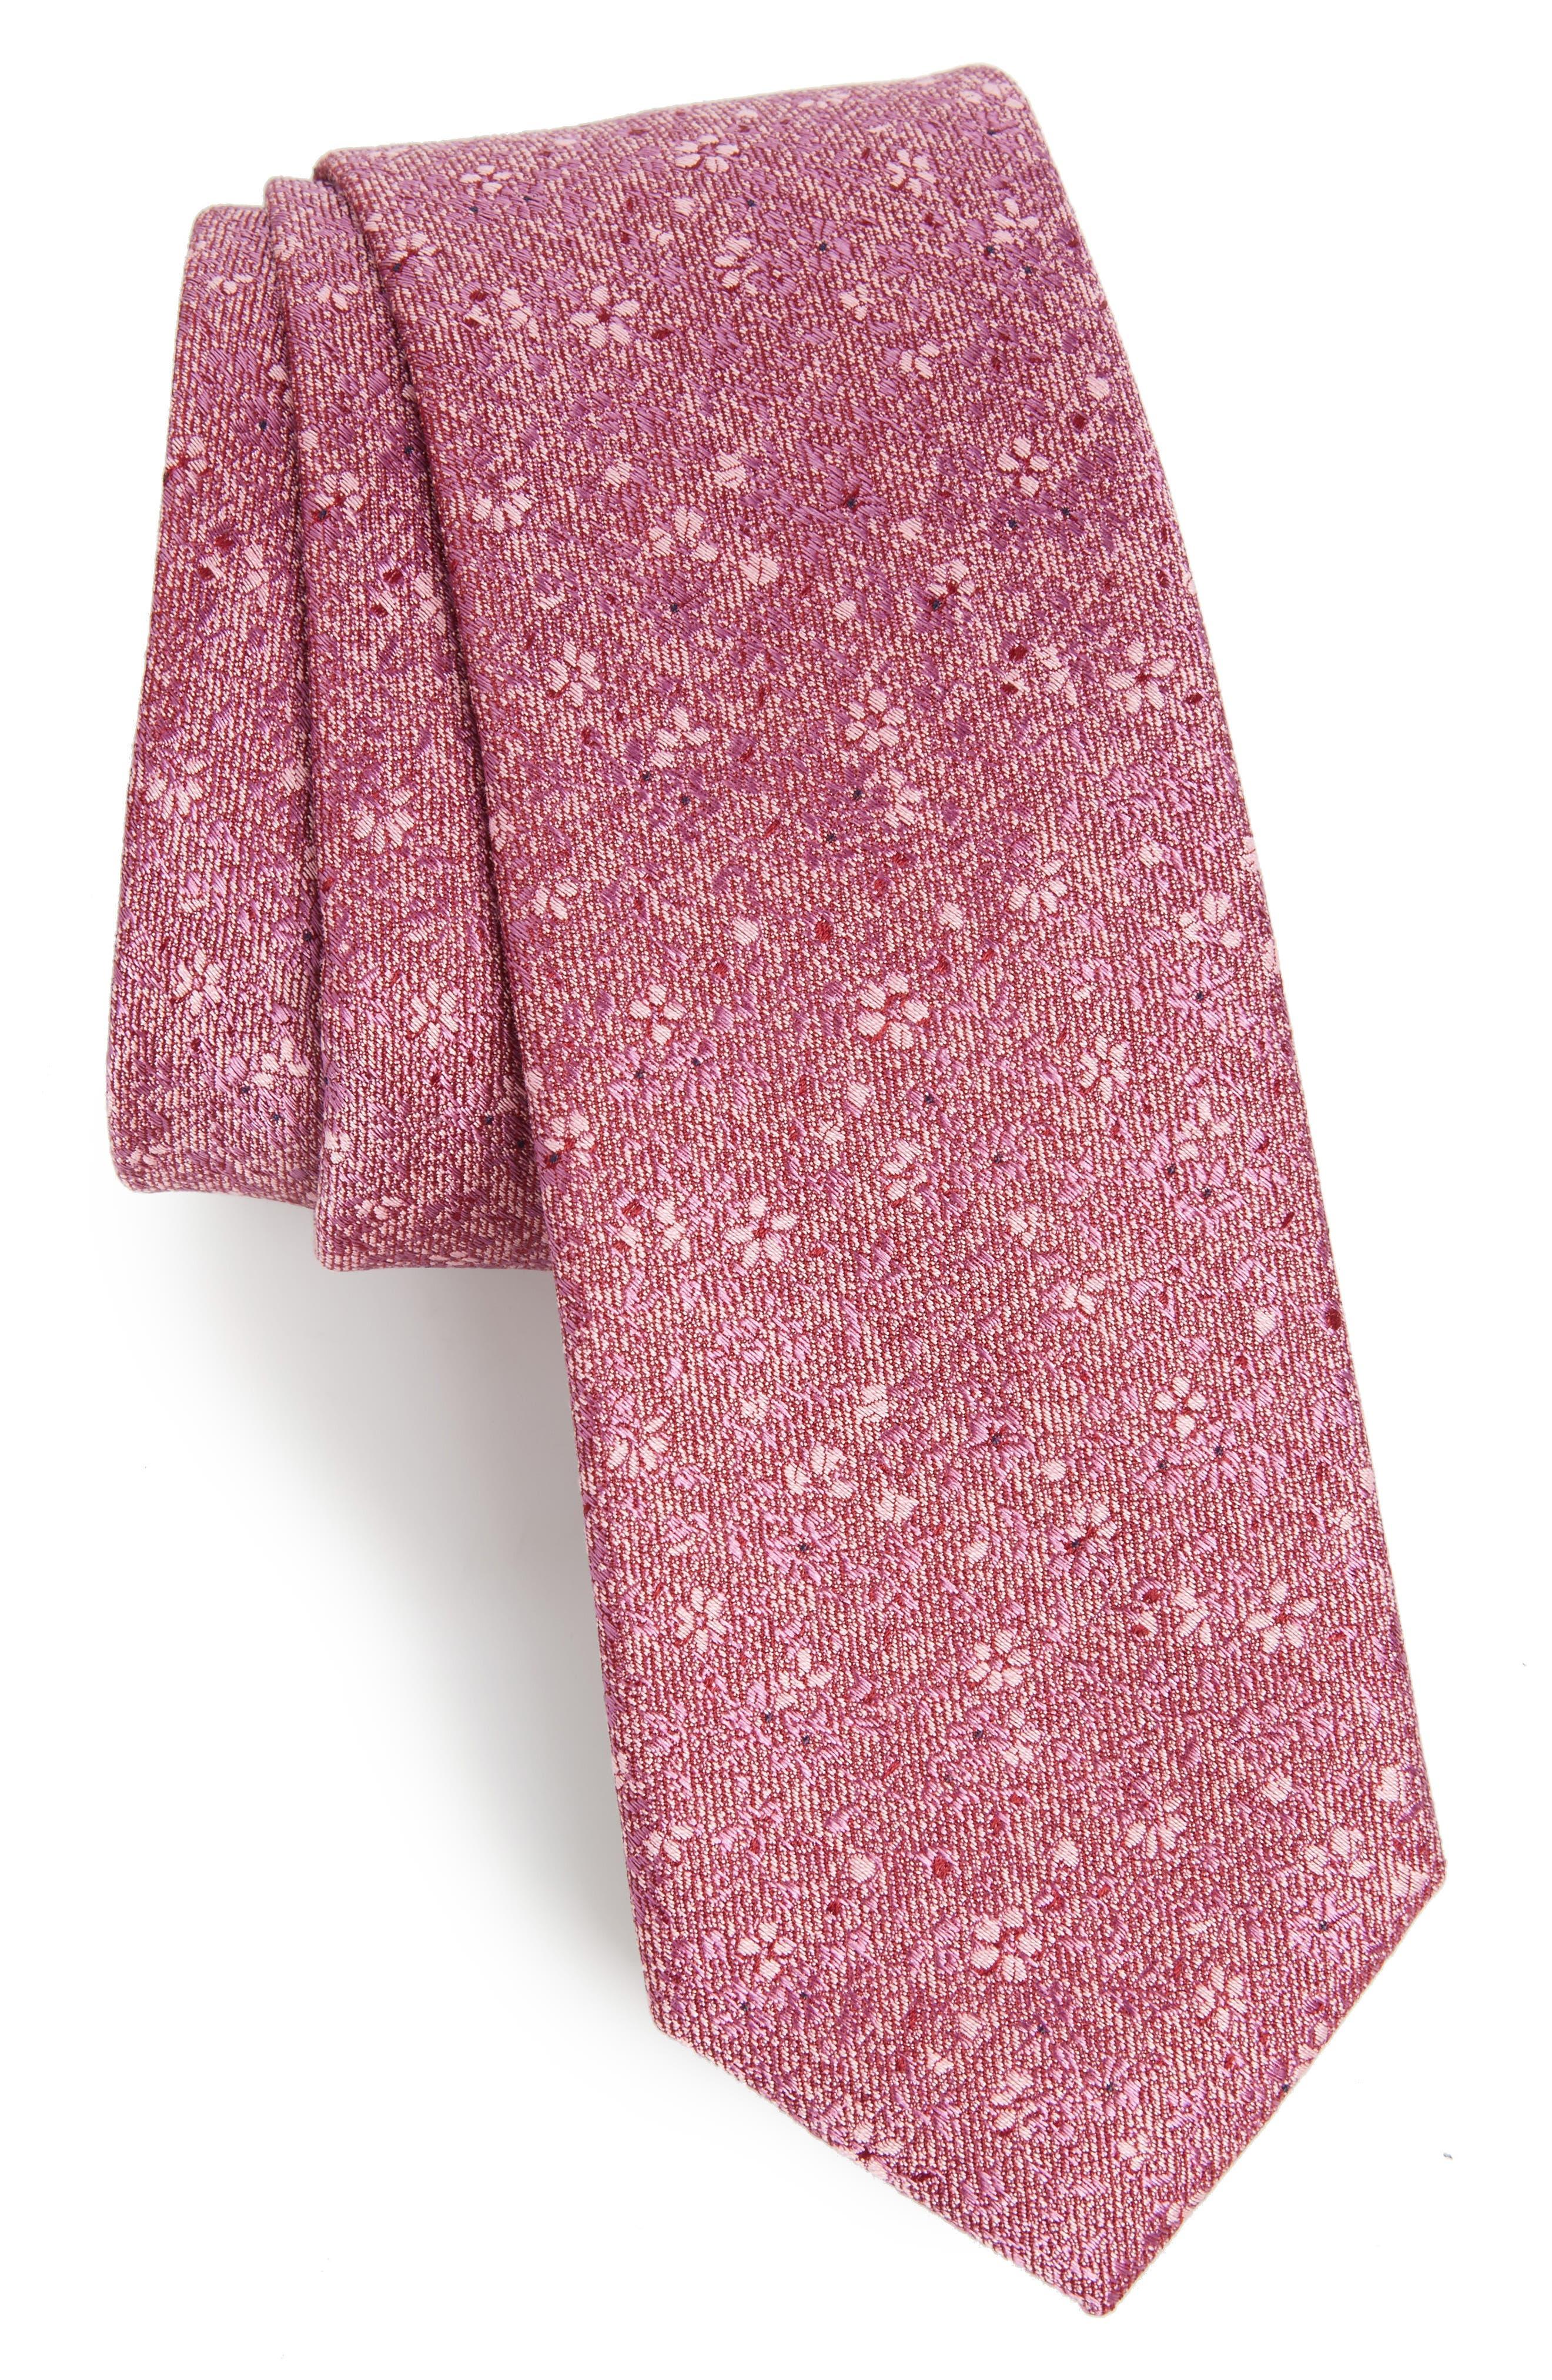 Main Image - Calibrate Lindsay Floral Print Silk & Cotton Tie